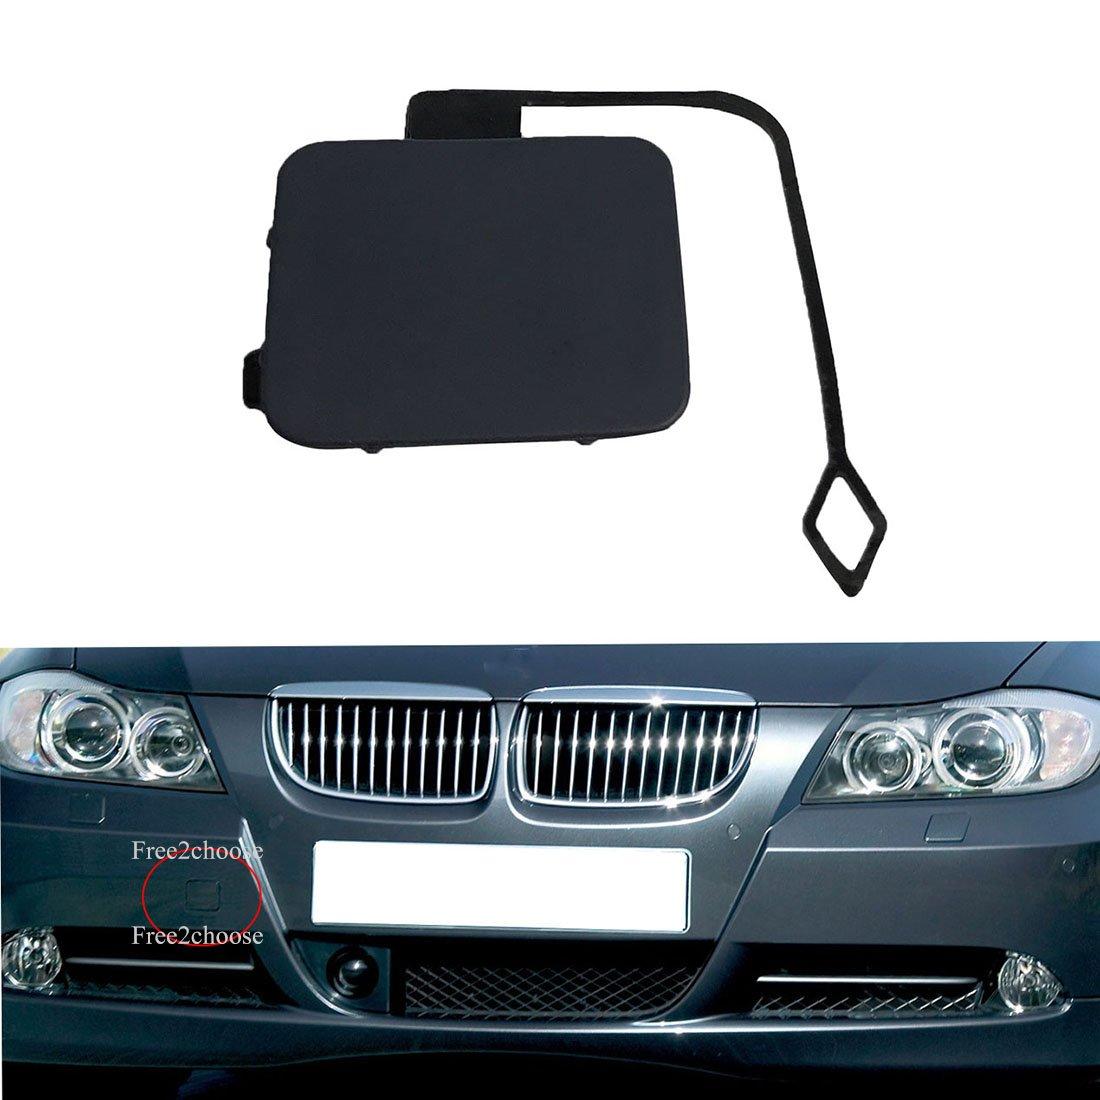 Free2choose Front Bumper Tow Hook Cover Cap for E90 E91 2005 2006 2007 2008 318i 320i 328i 330i 3